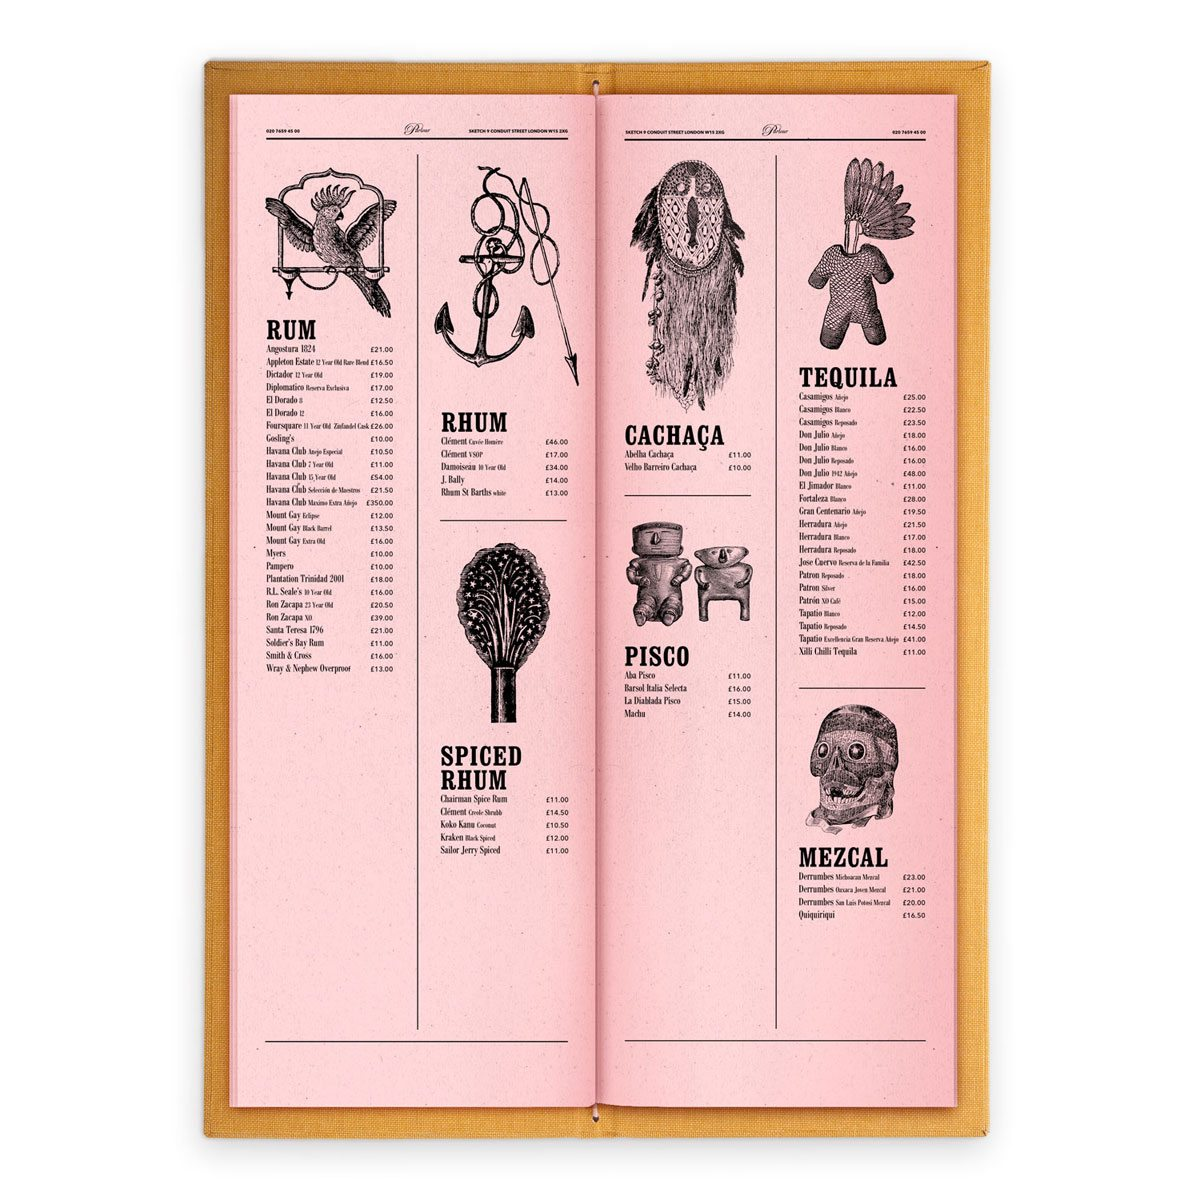 sketch london wine list parlour pink gravures anciennes engraving vintage punk voodoo spirits